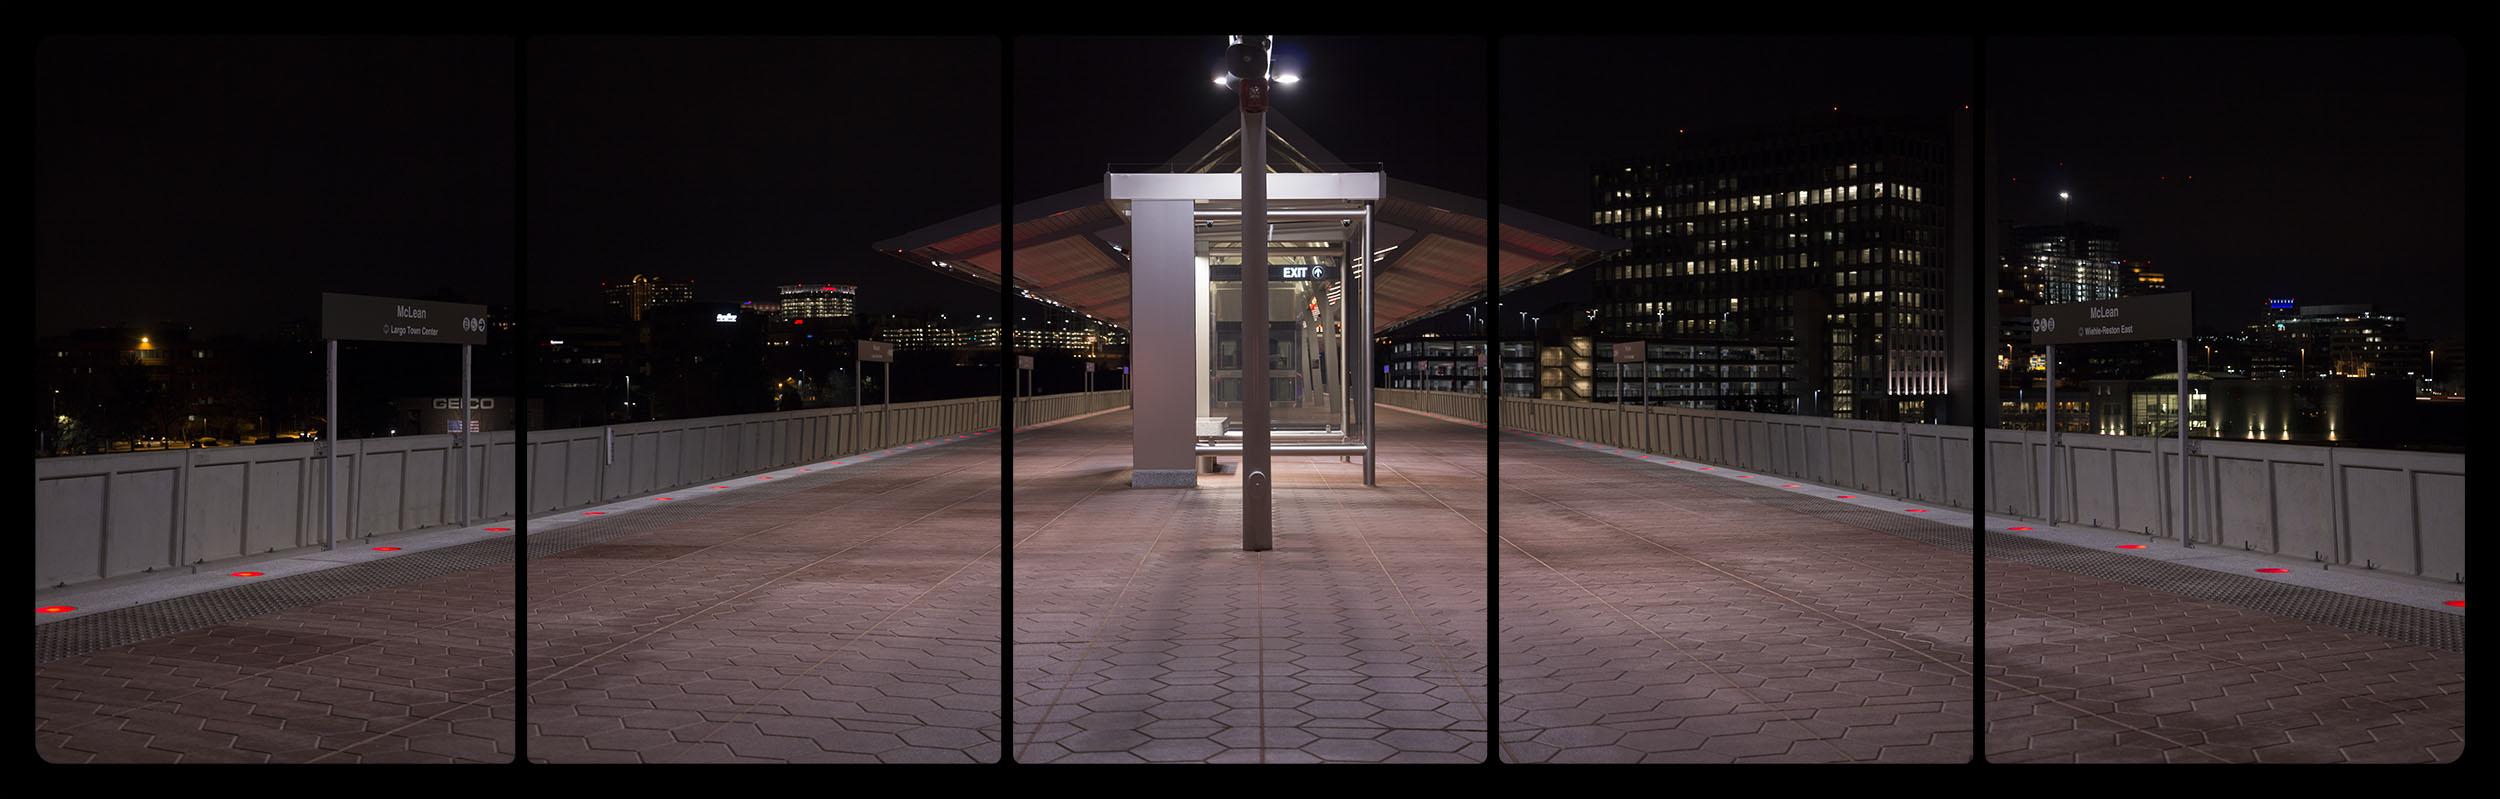 Metro Rail, McLean,11-29-2014,4208-4212